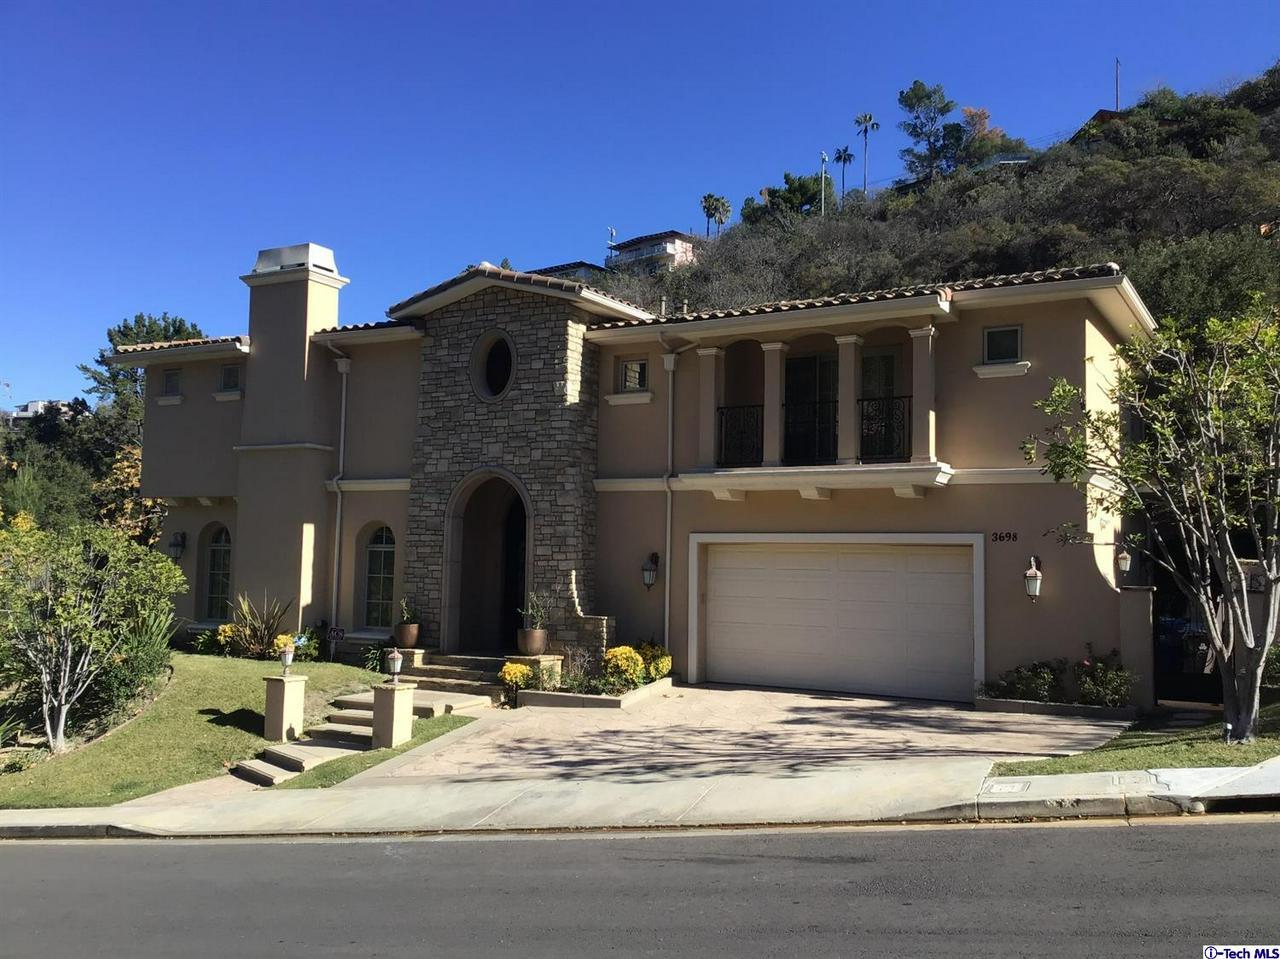 Photo of 3698 BENEDICT CANYON LANE, Sherman Oaks, CA 91423